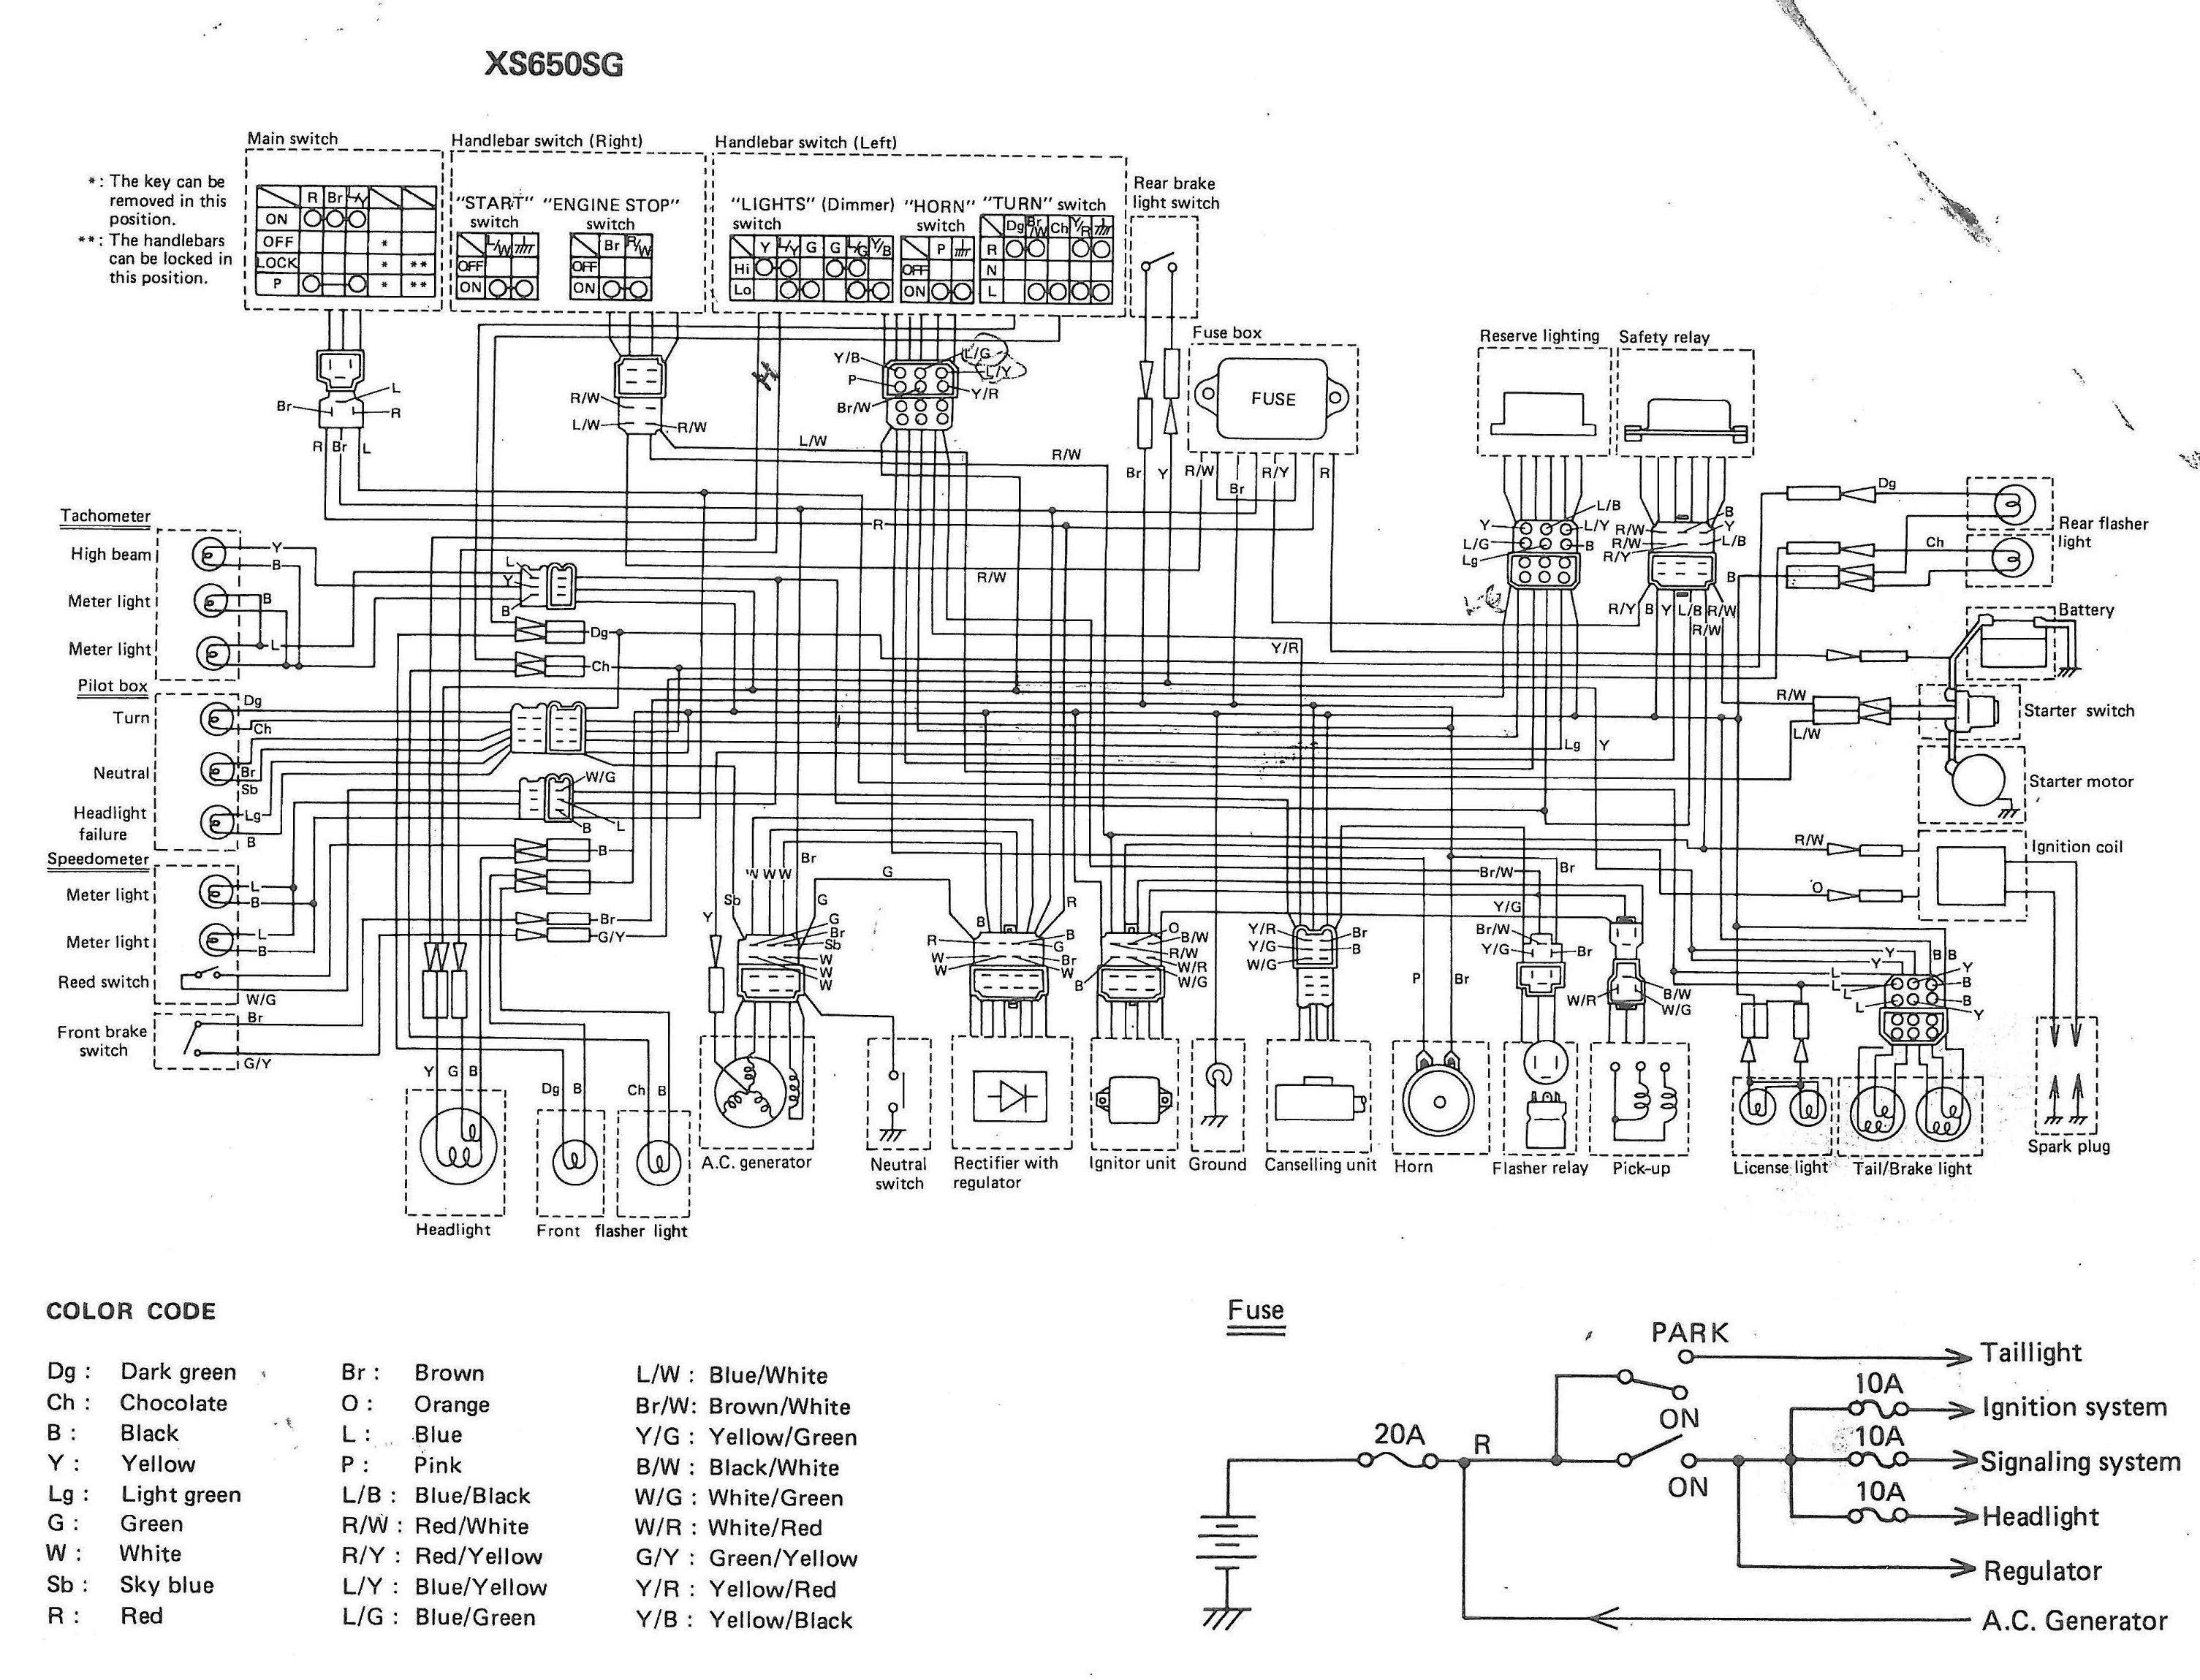 1978-yamaha-xs650-wiring-diagram-13 Xs Simplified Wiring Harness on